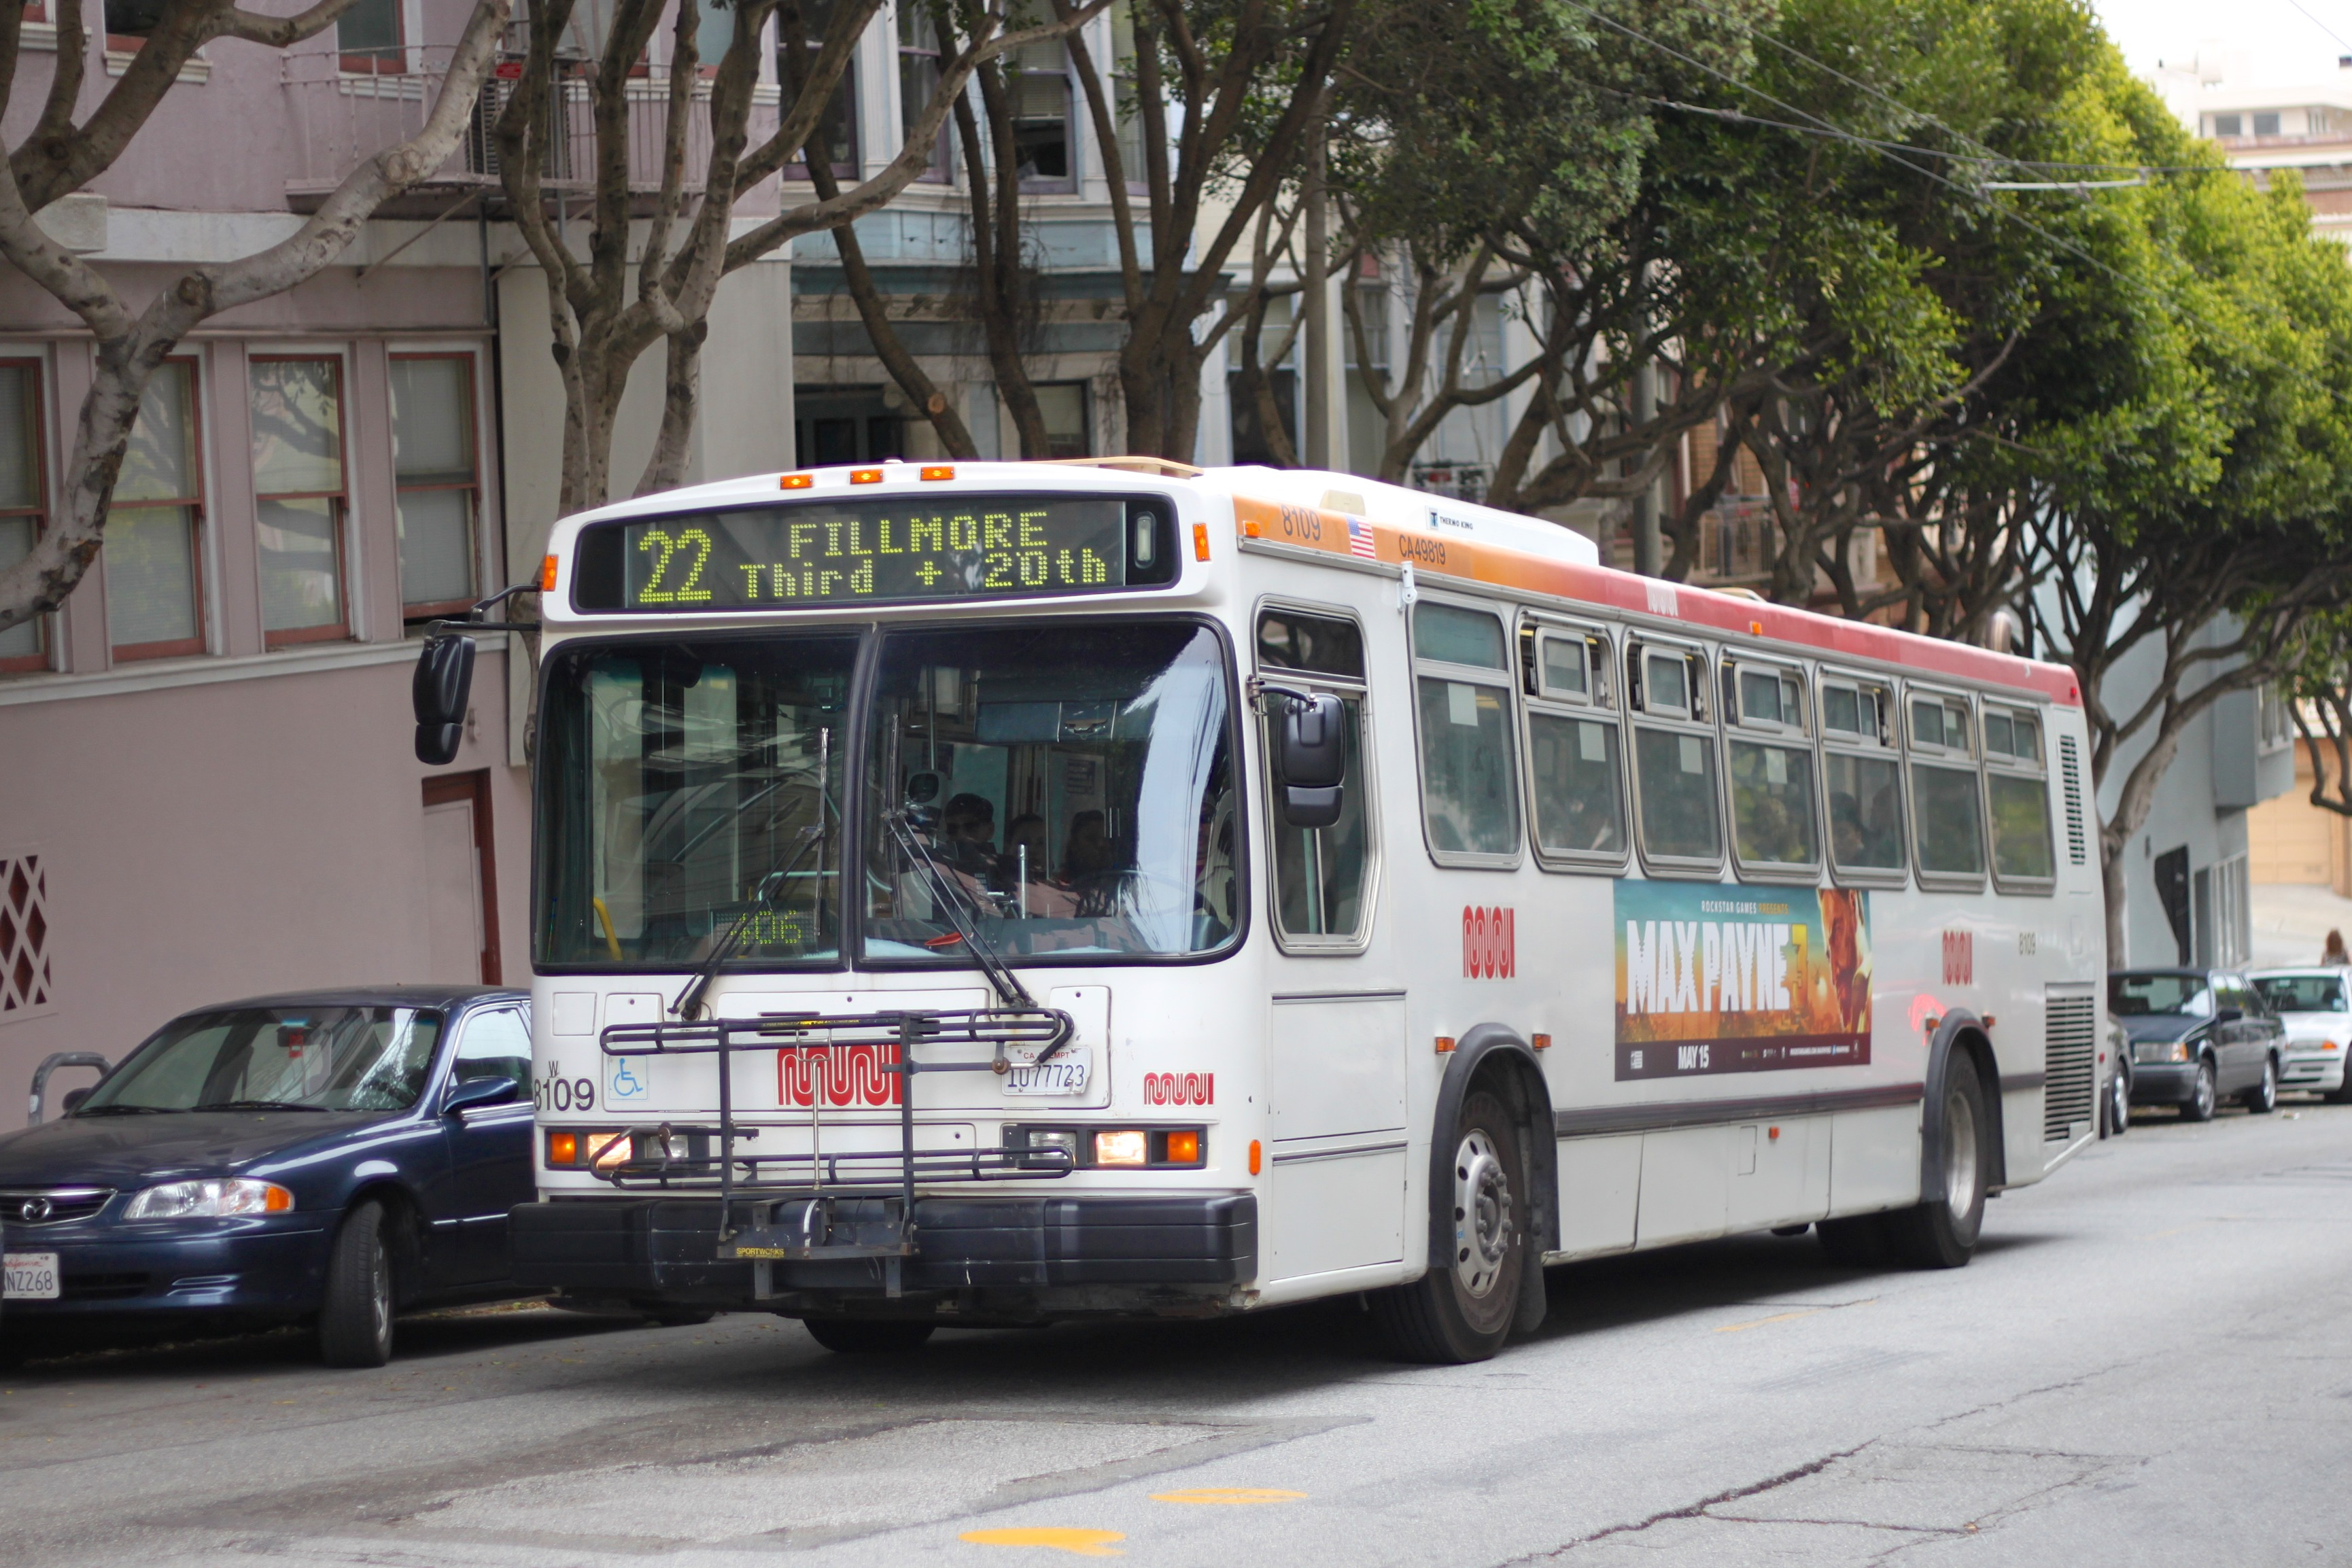 A 22 Fillmore bus.